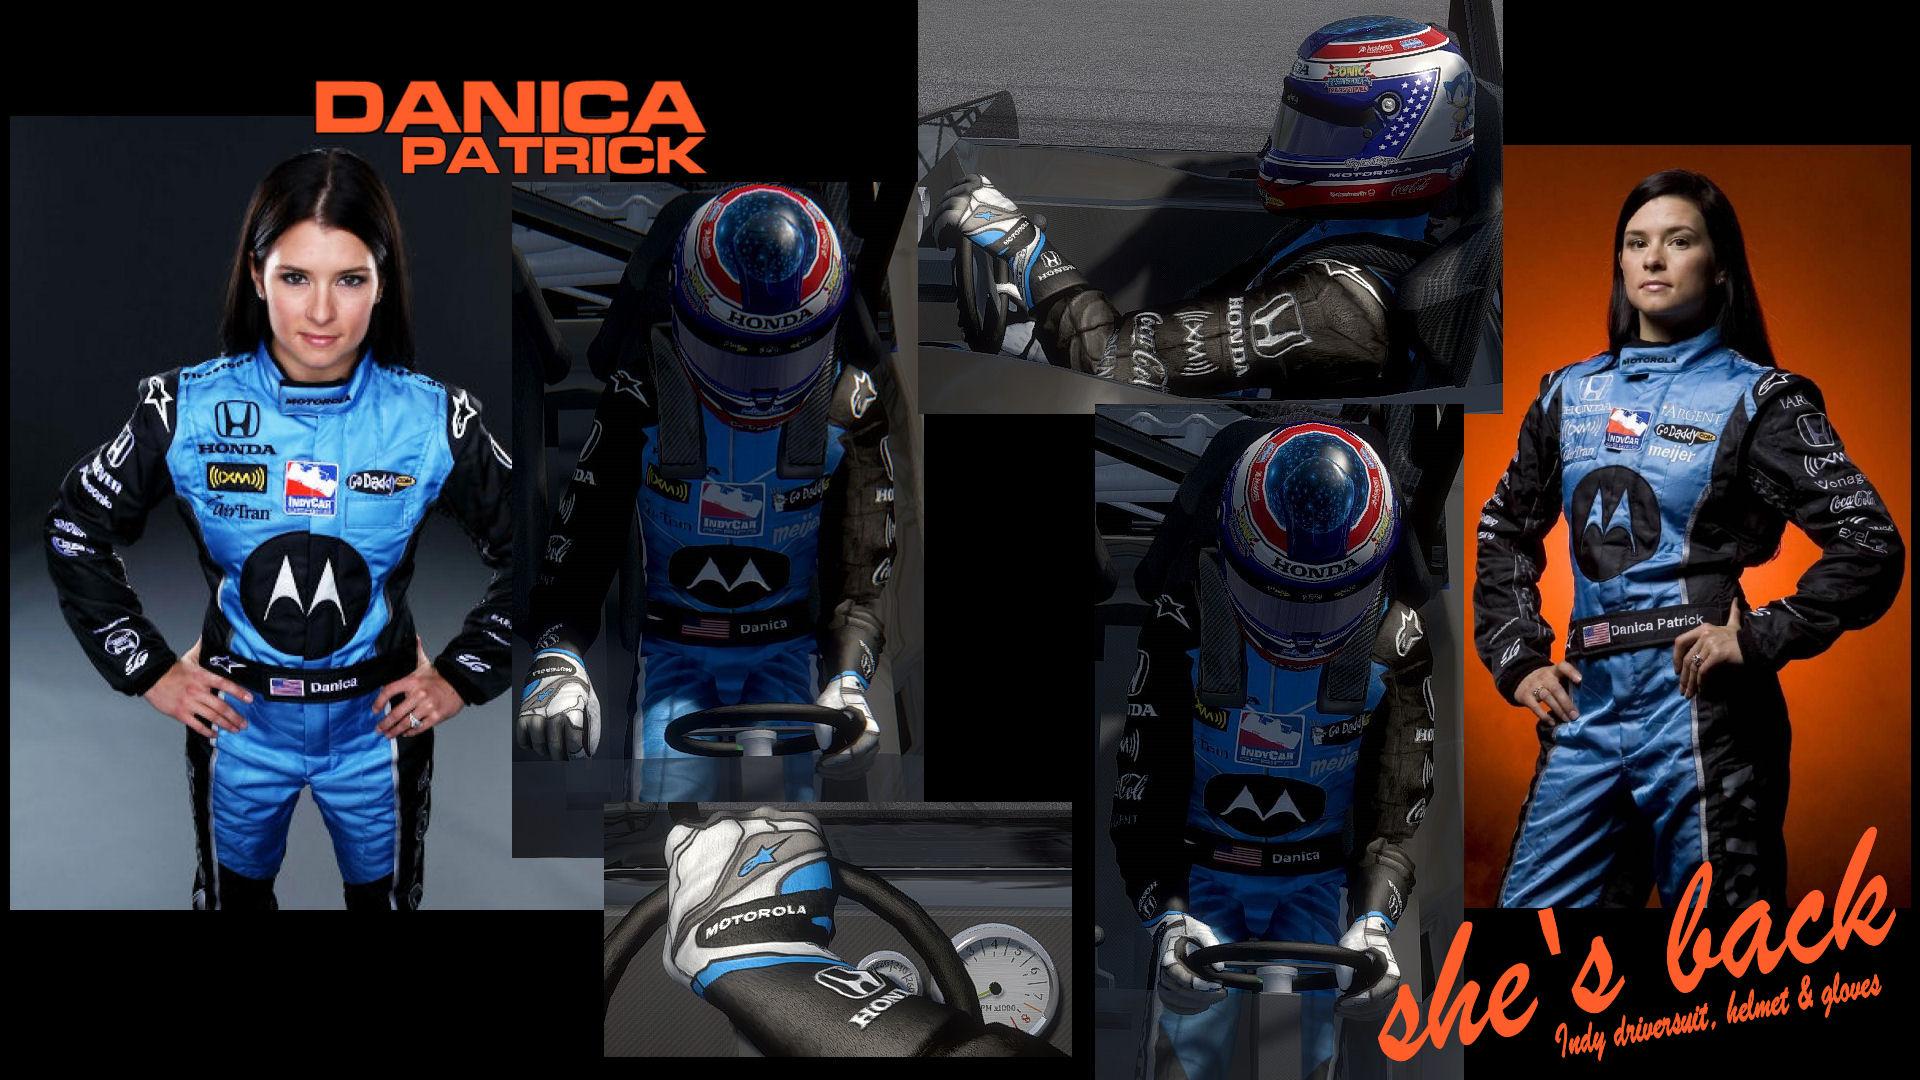 Danica Indy Suit